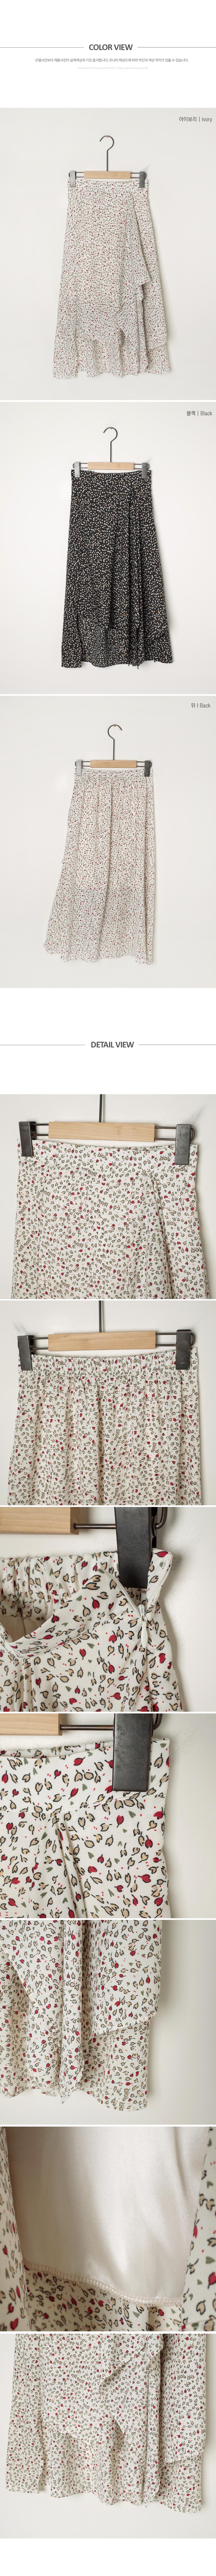 You look like a flower skirt